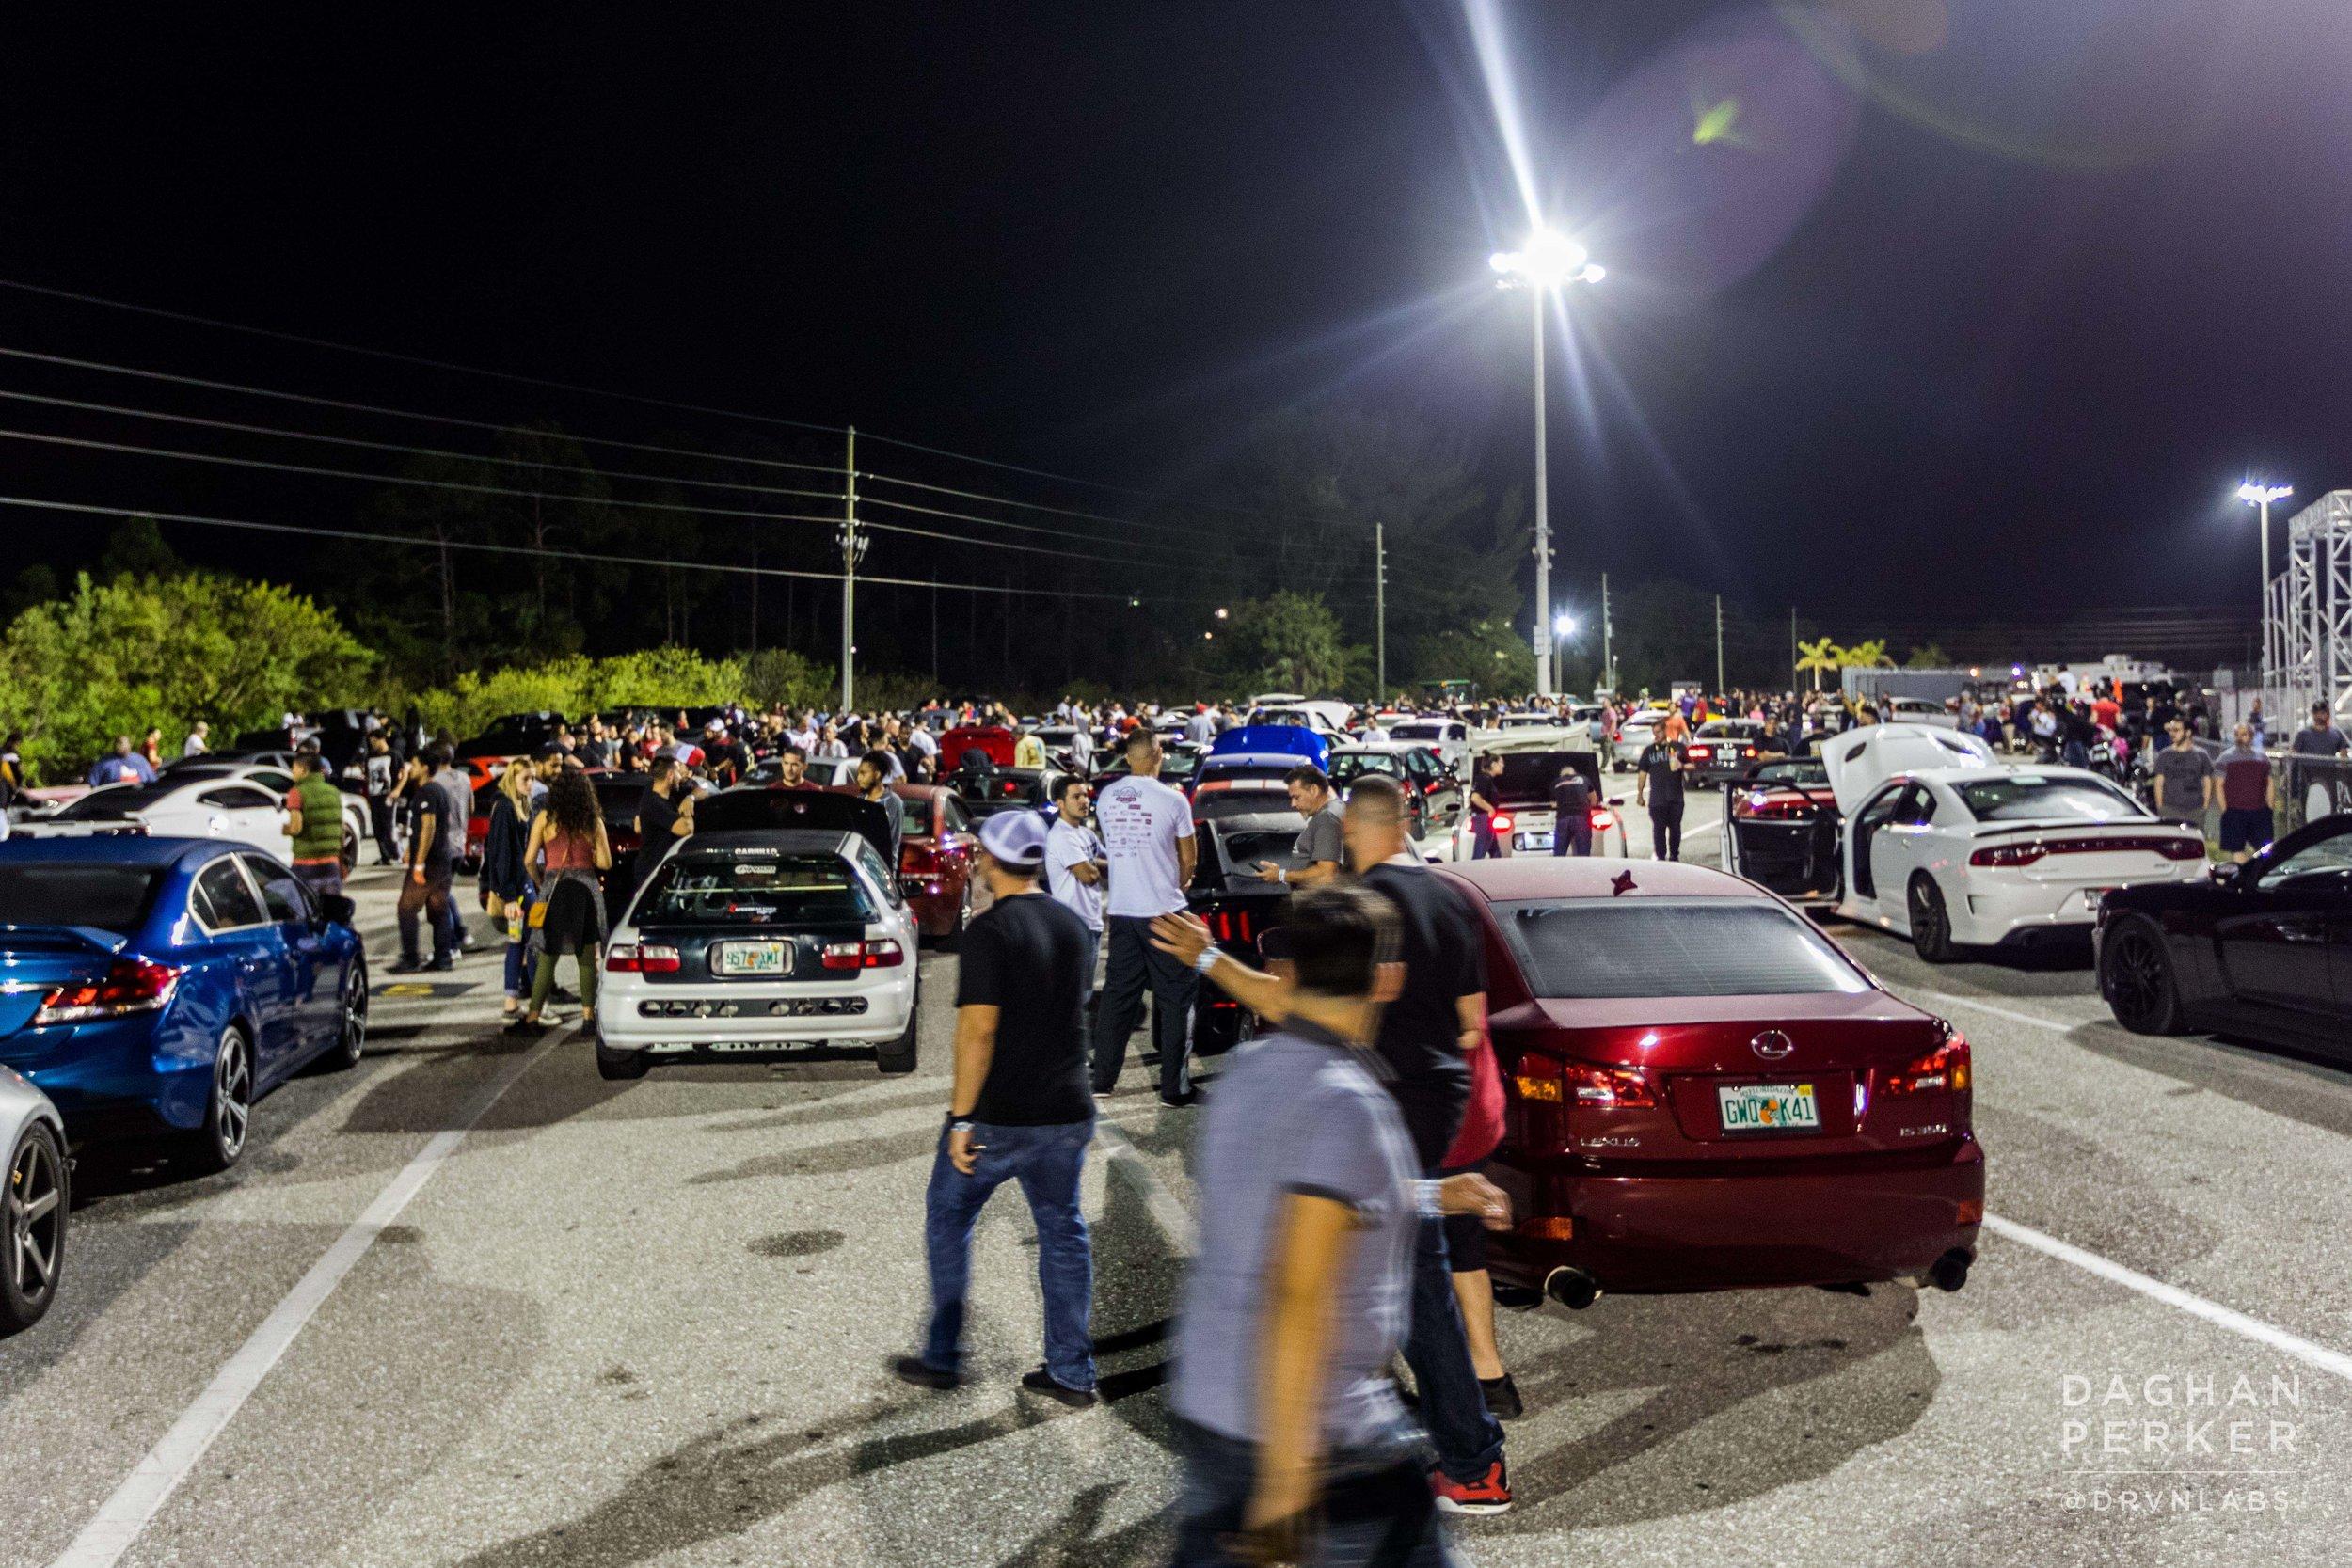 180210-Miami_cars-1613.jpg